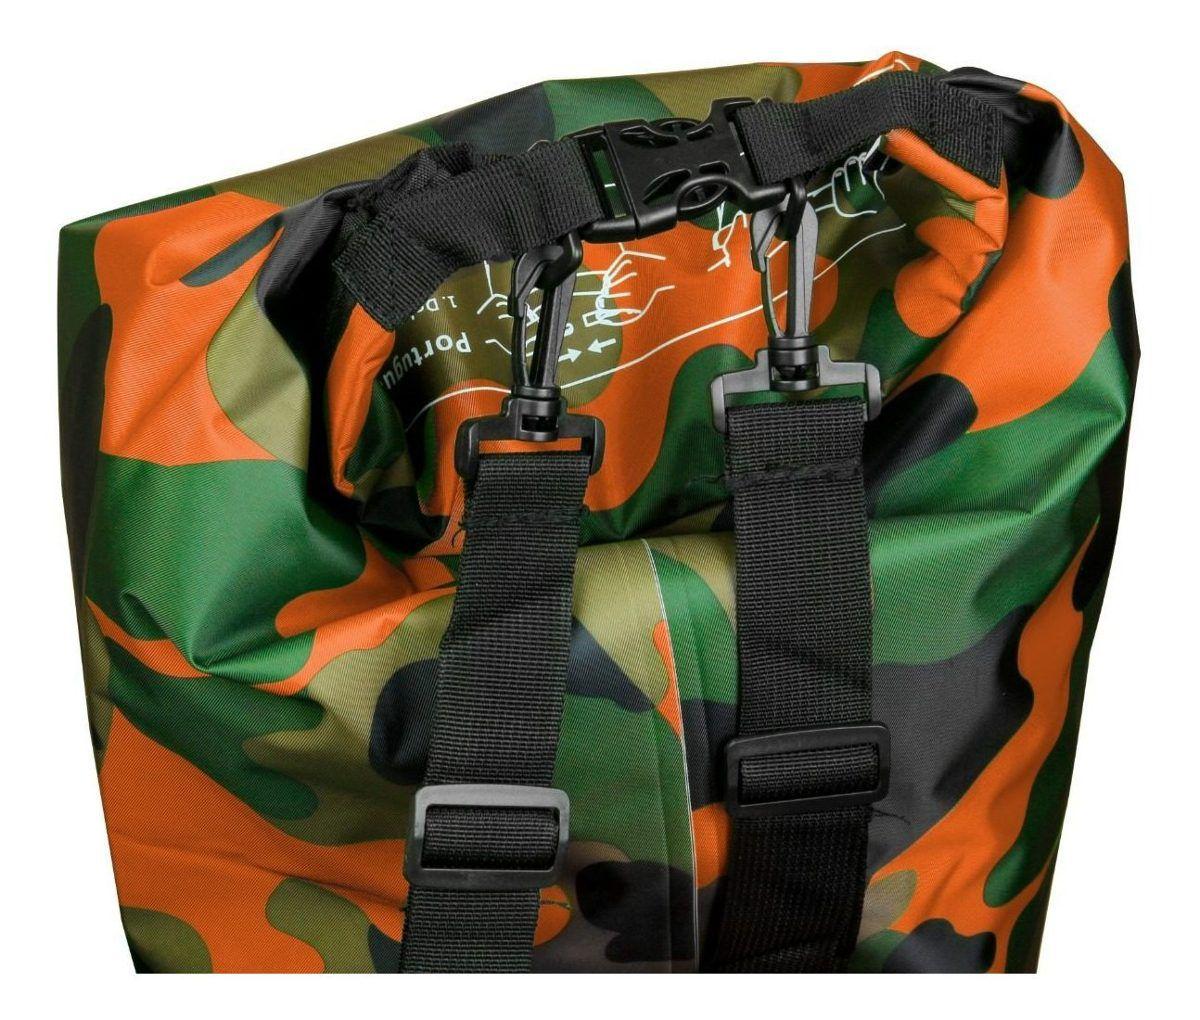 Bolsa Impermeável Albatroz Fishing Camp Bag Camuflada Laranja 30 Litros